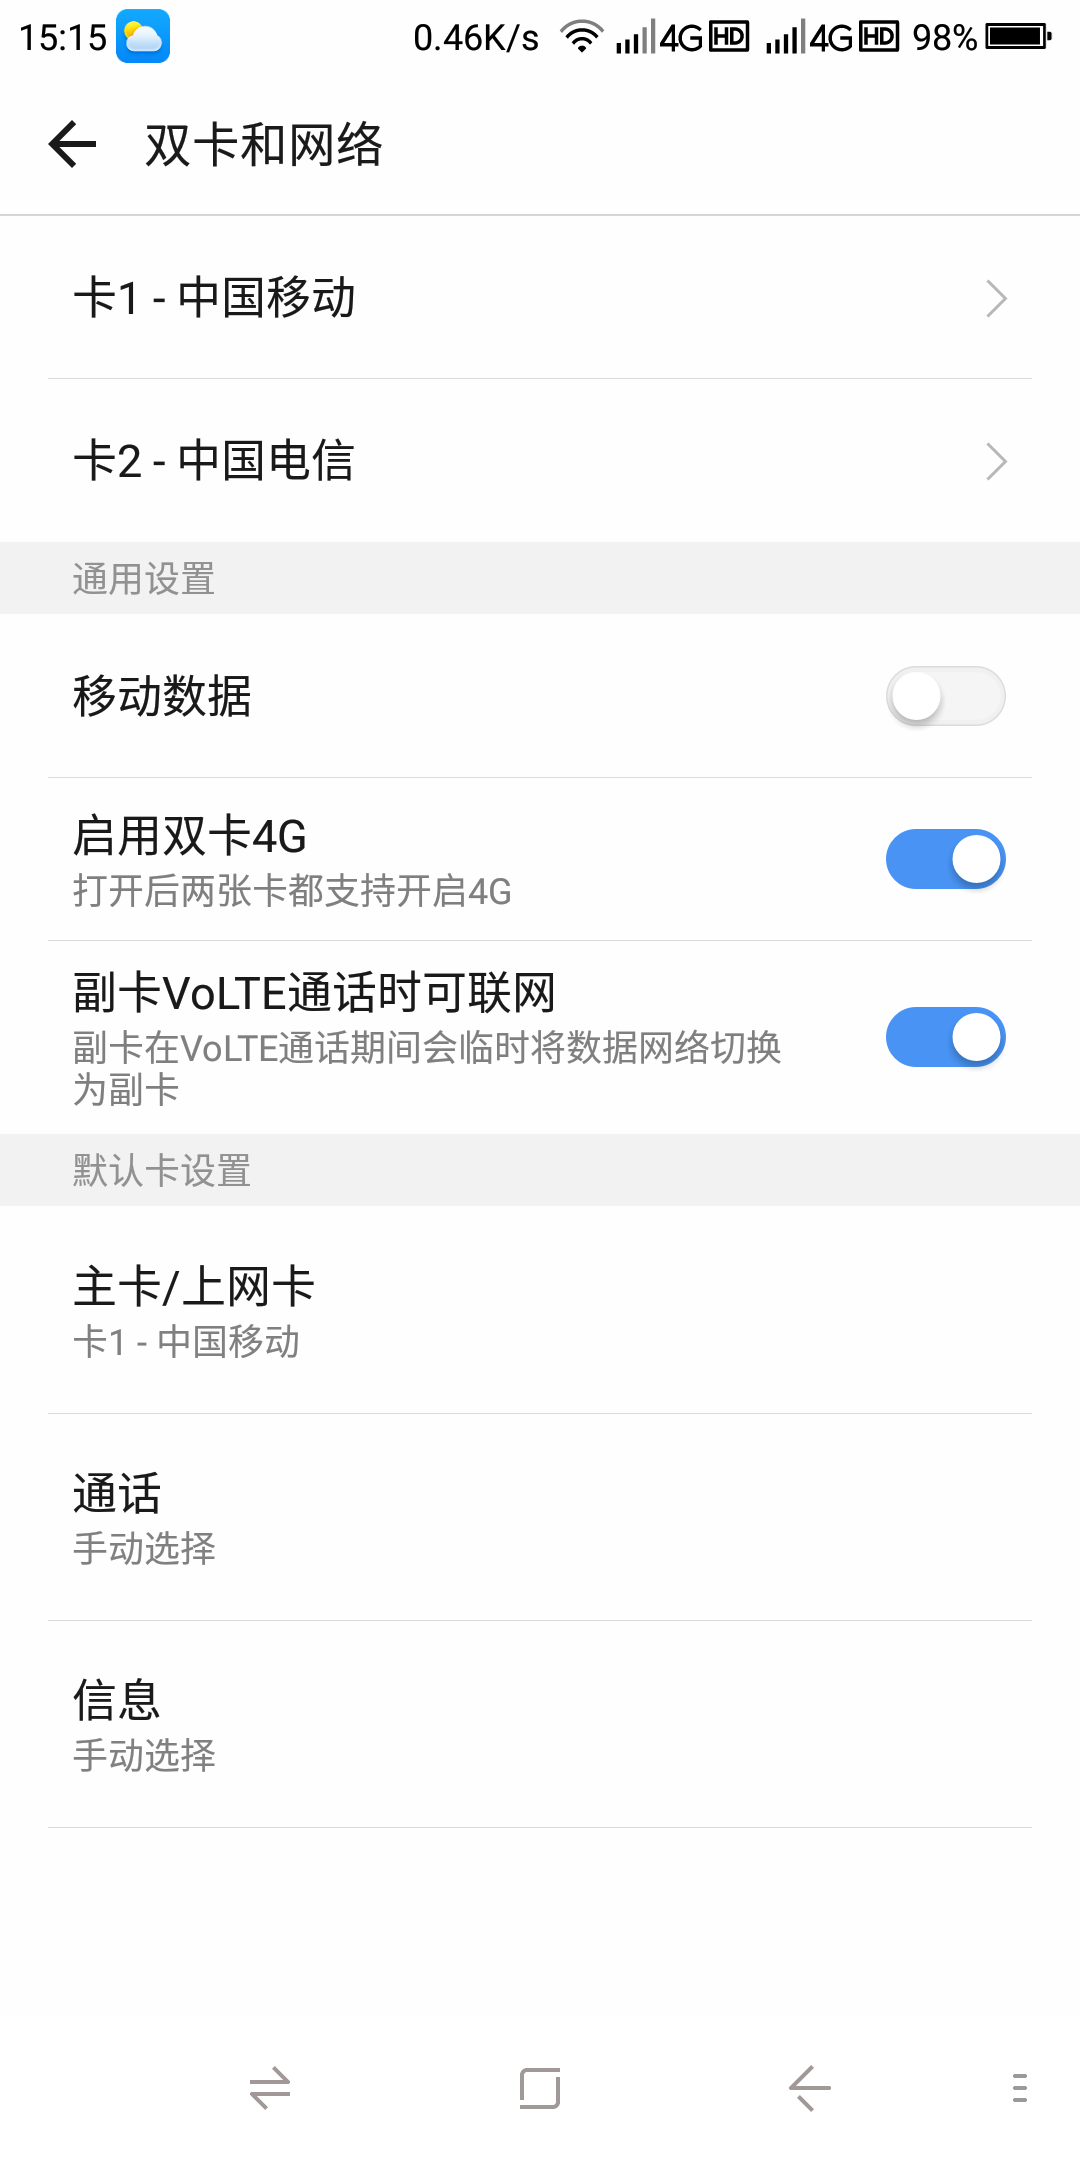 Screenshot_2018-10-31-15-16-00.png